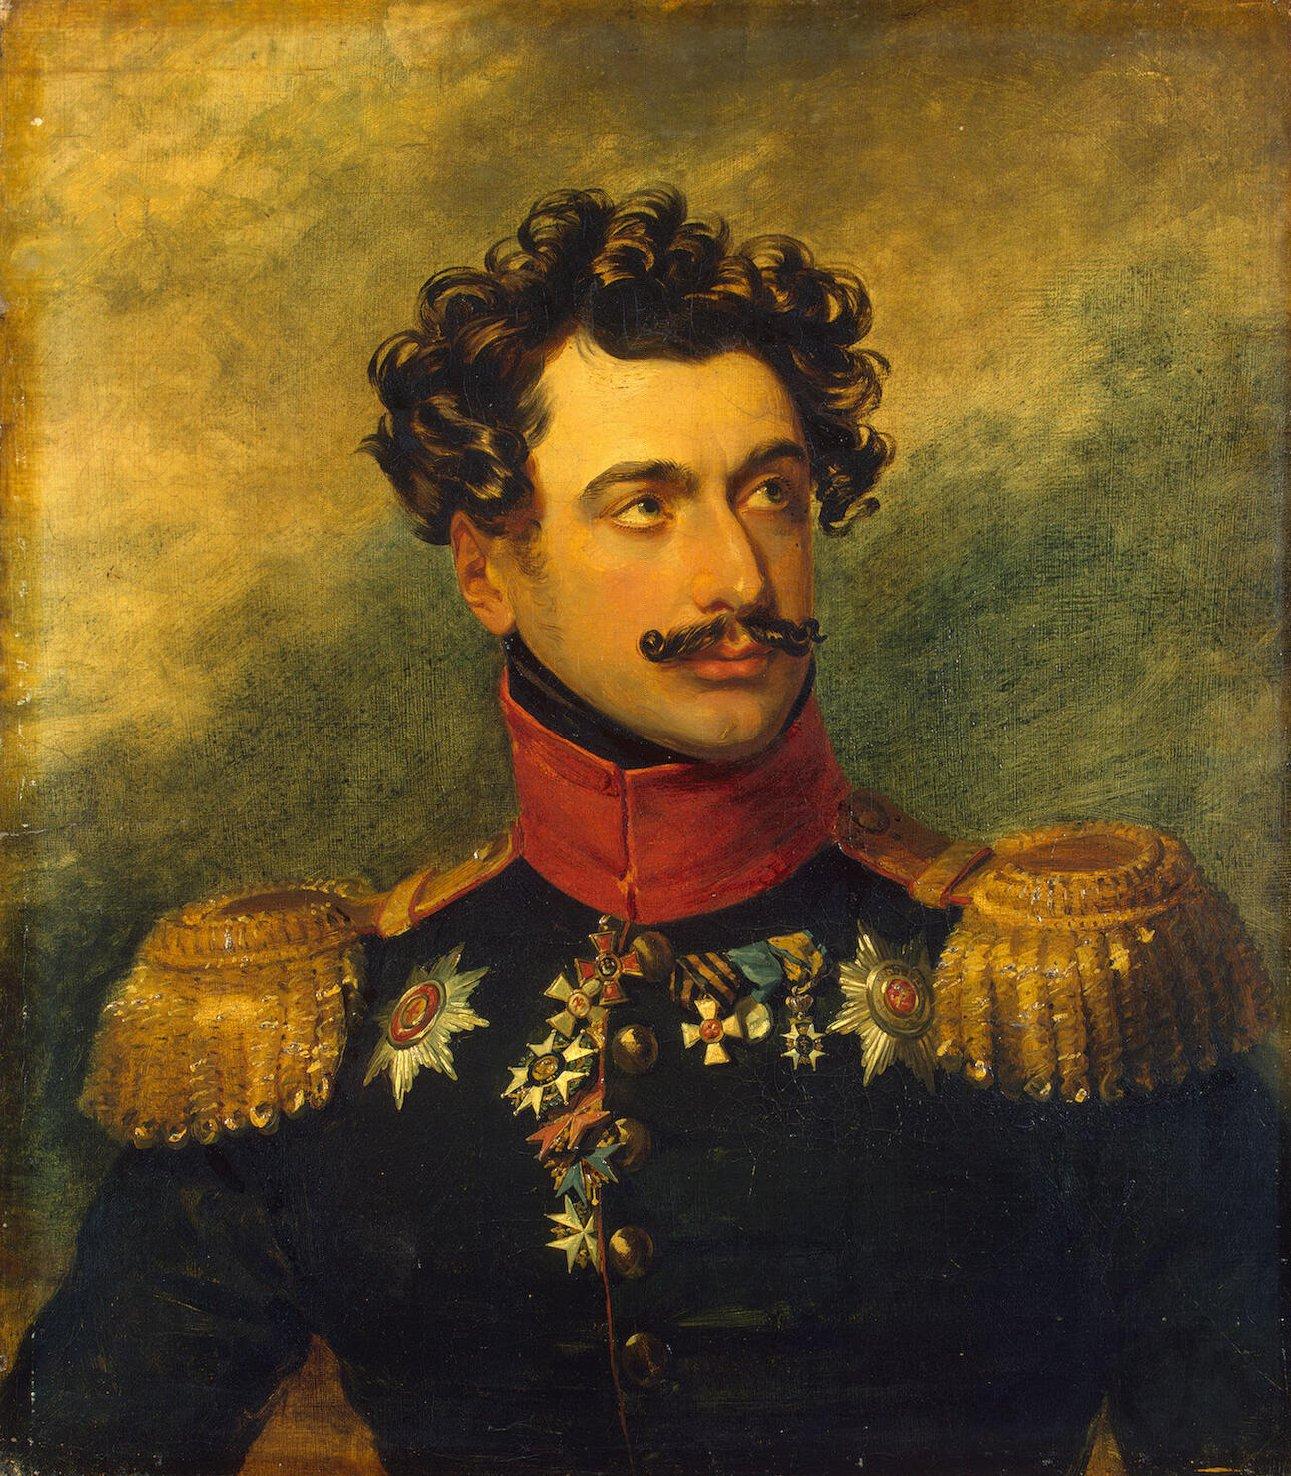 Нарышкин, Лев Александрович